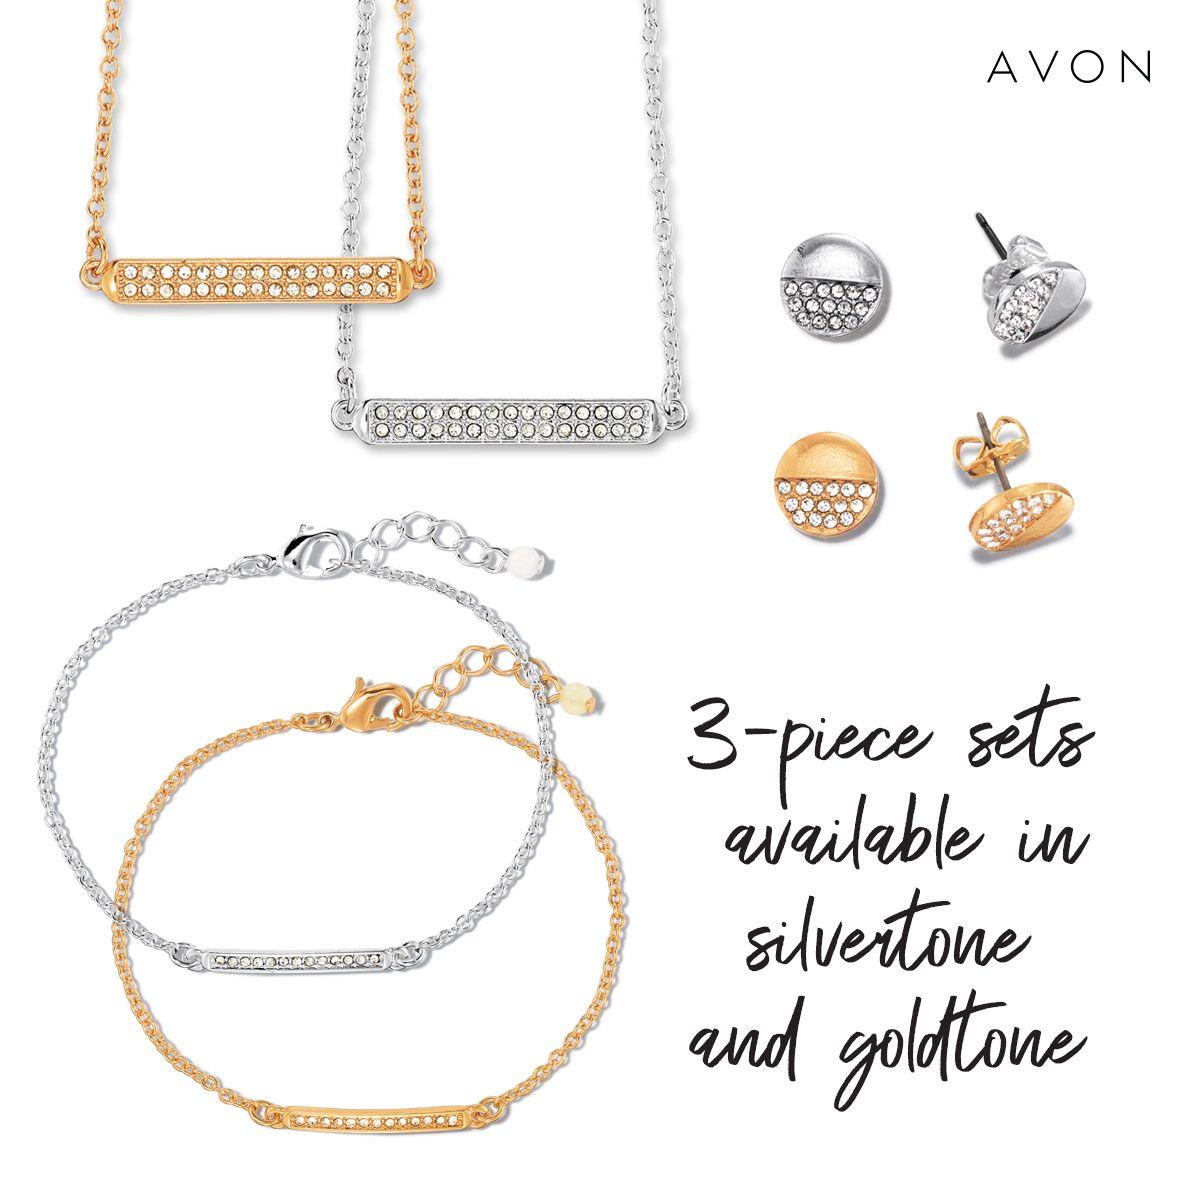 night out accessories Sparkly trio of bracelets velvet sparkles